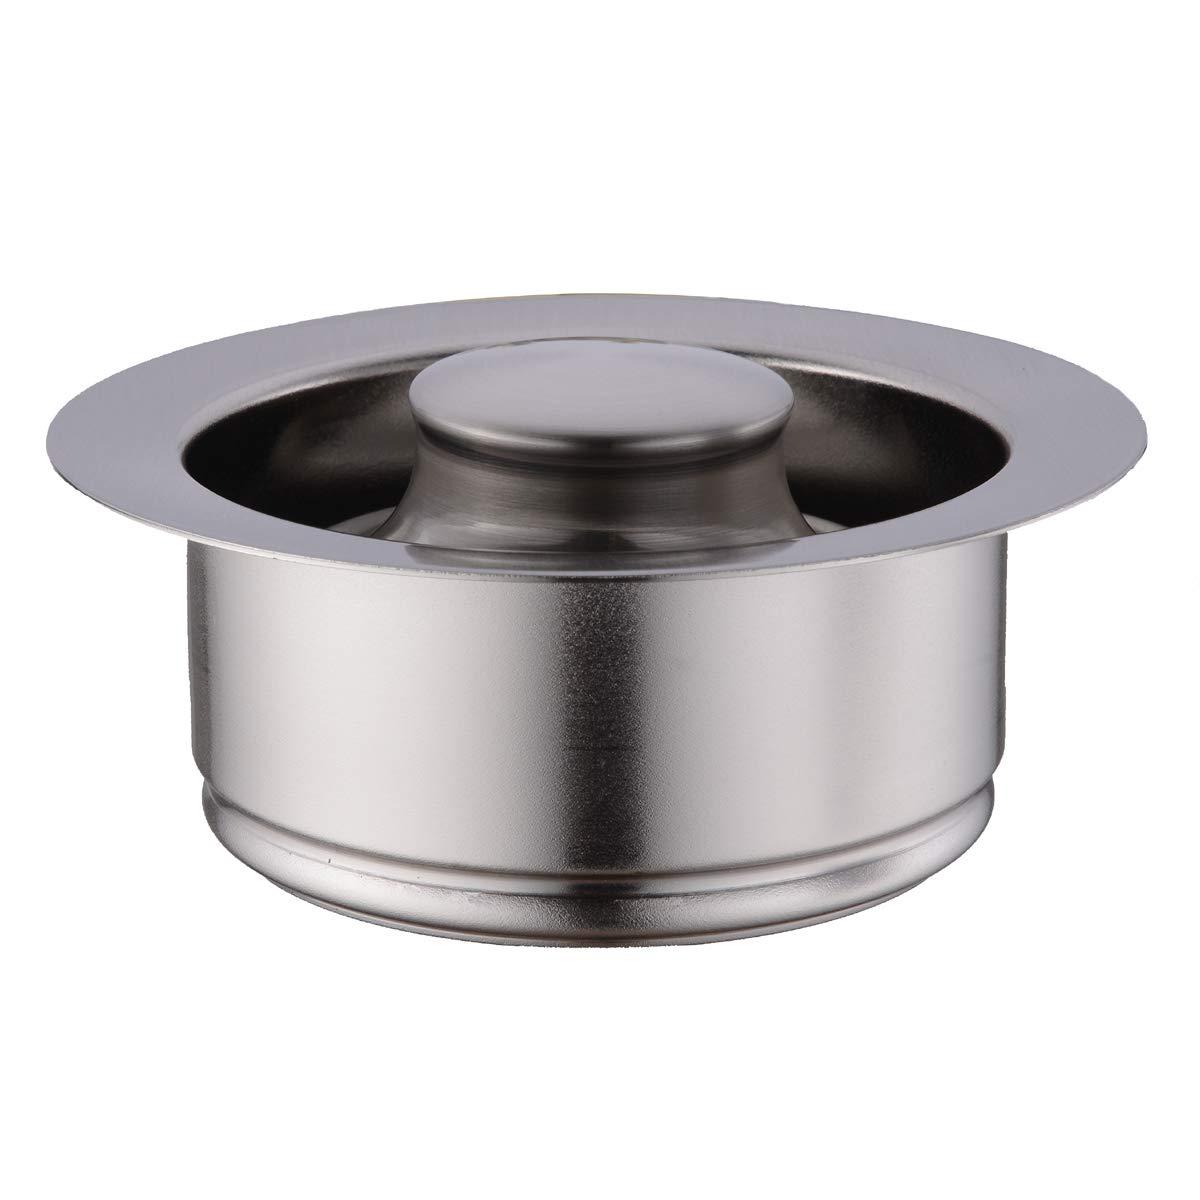 BESTILL Brass Kitchen Sink Flange Kit for 3-Bolt Mounted Garbage Disposal,Brushed Nickel